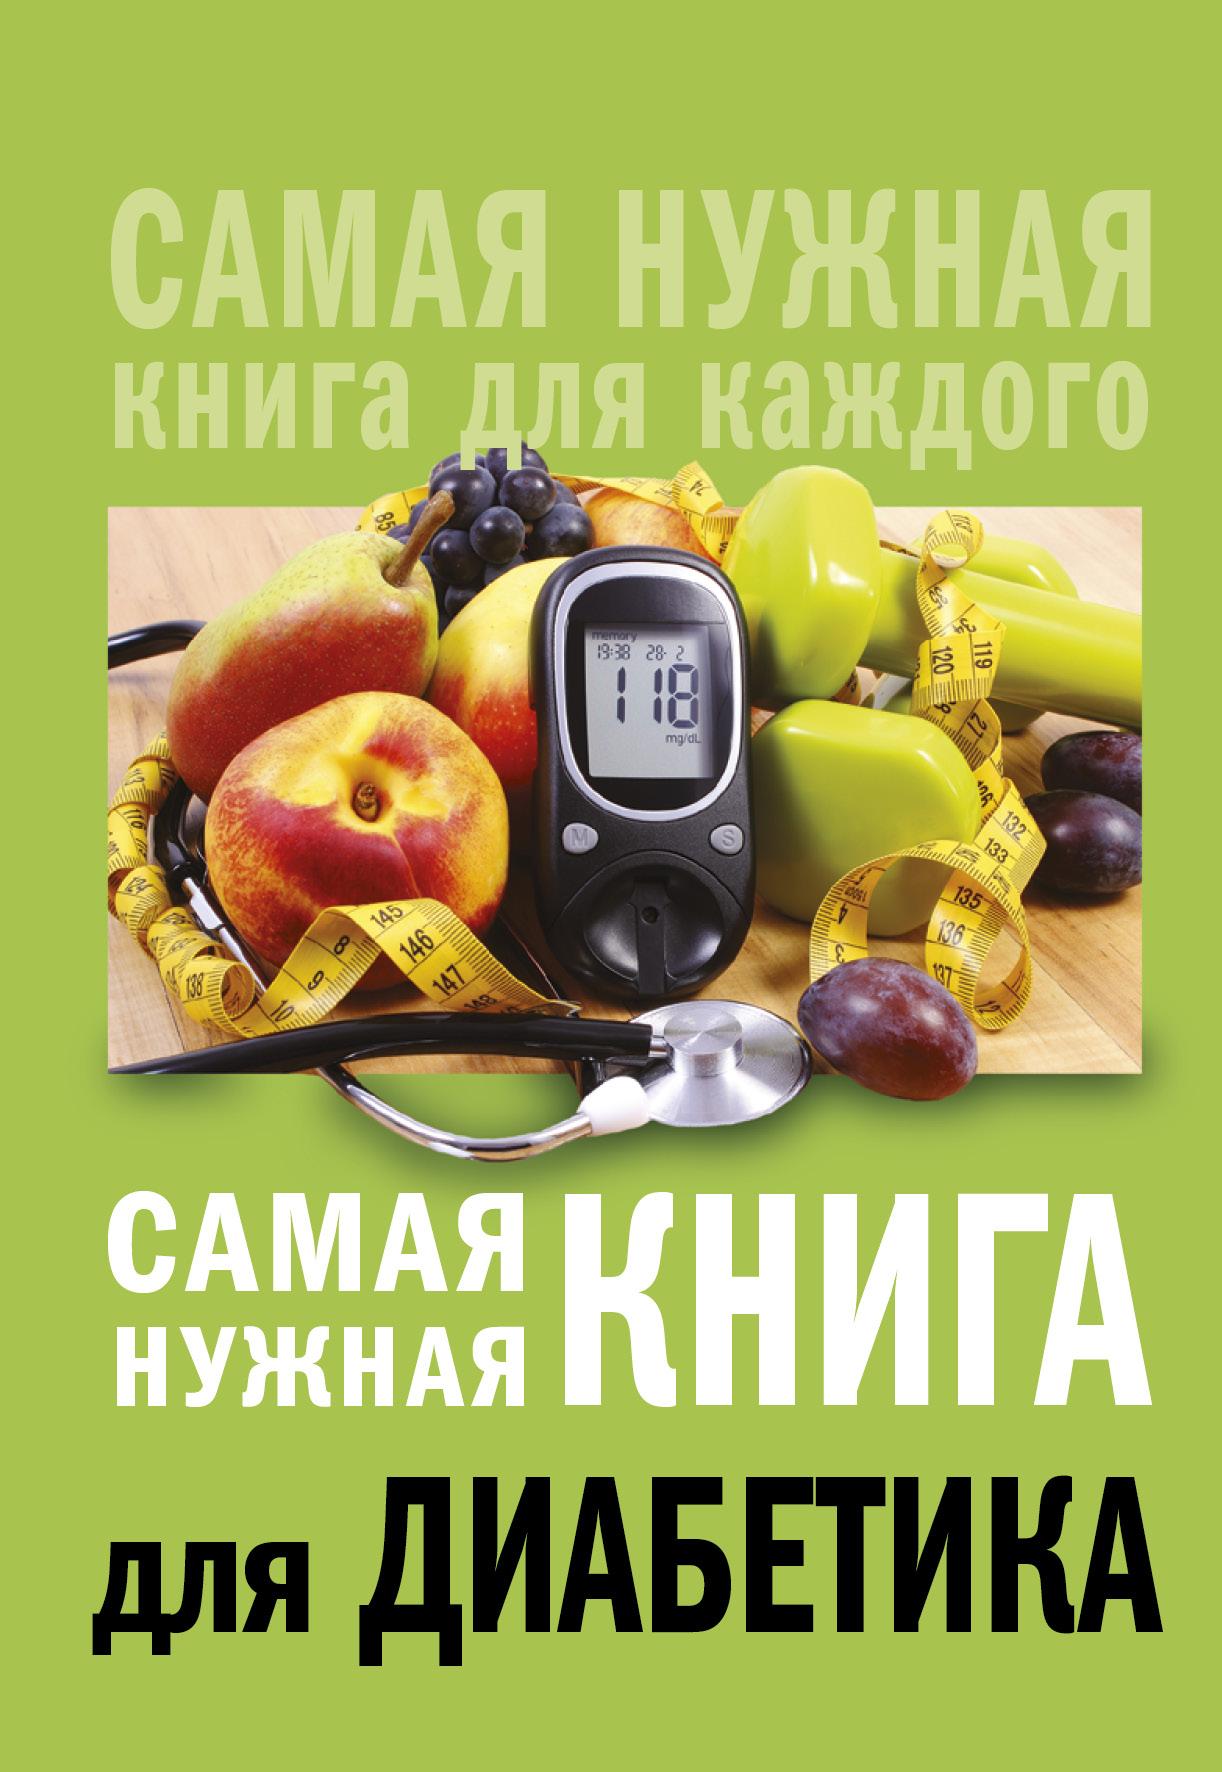 Самая нужная книга для диабетика ( Сергеева Е.В.  )